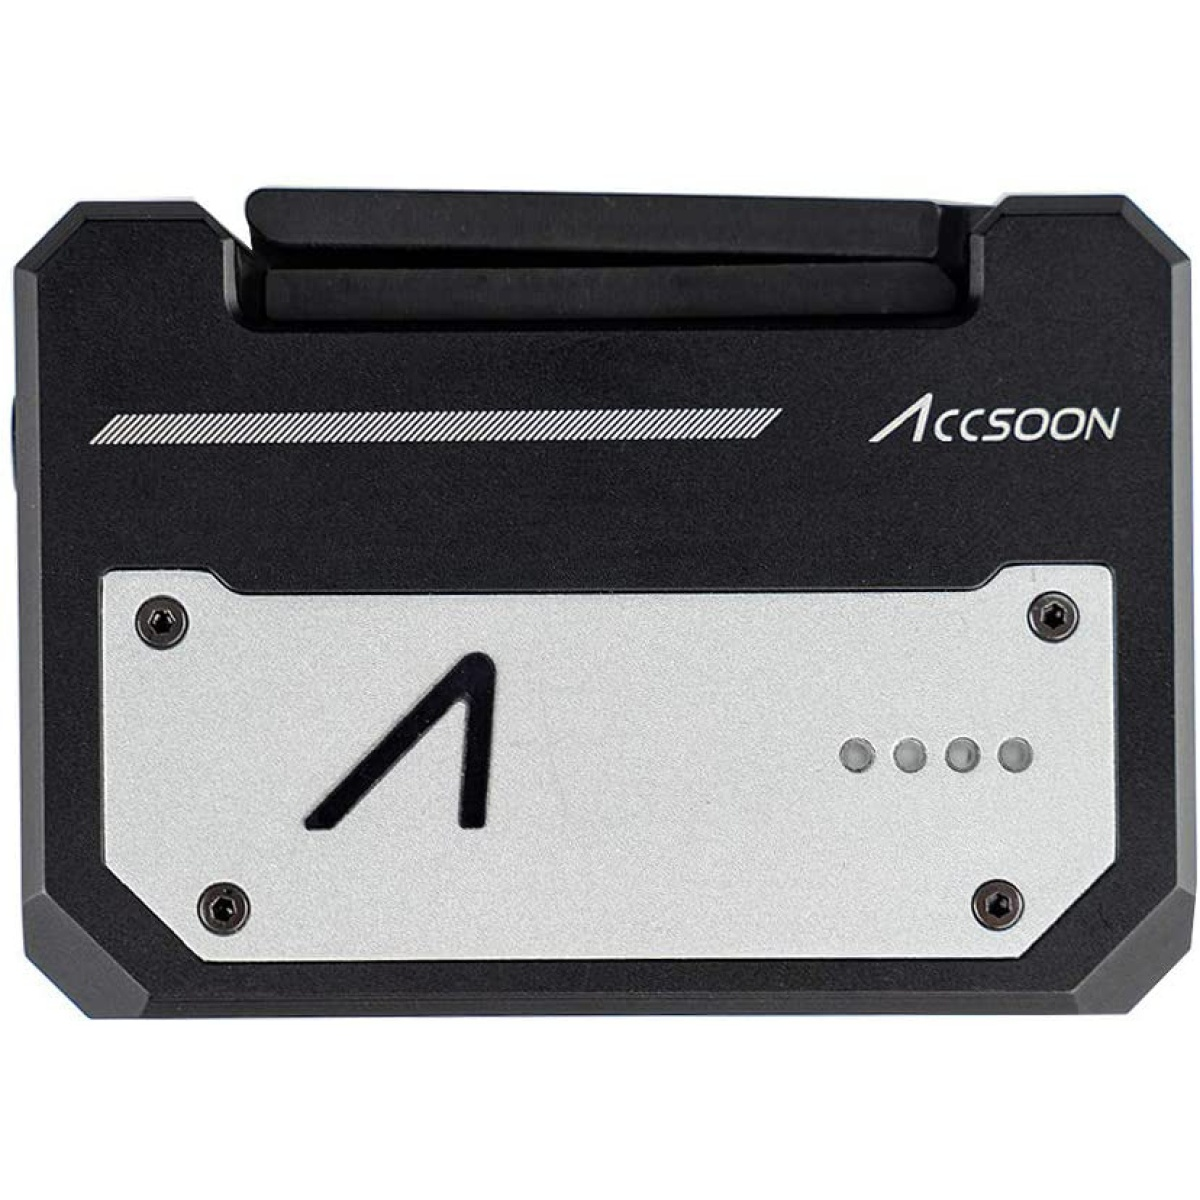 Accsoon Cineeye WIFI Transmitter